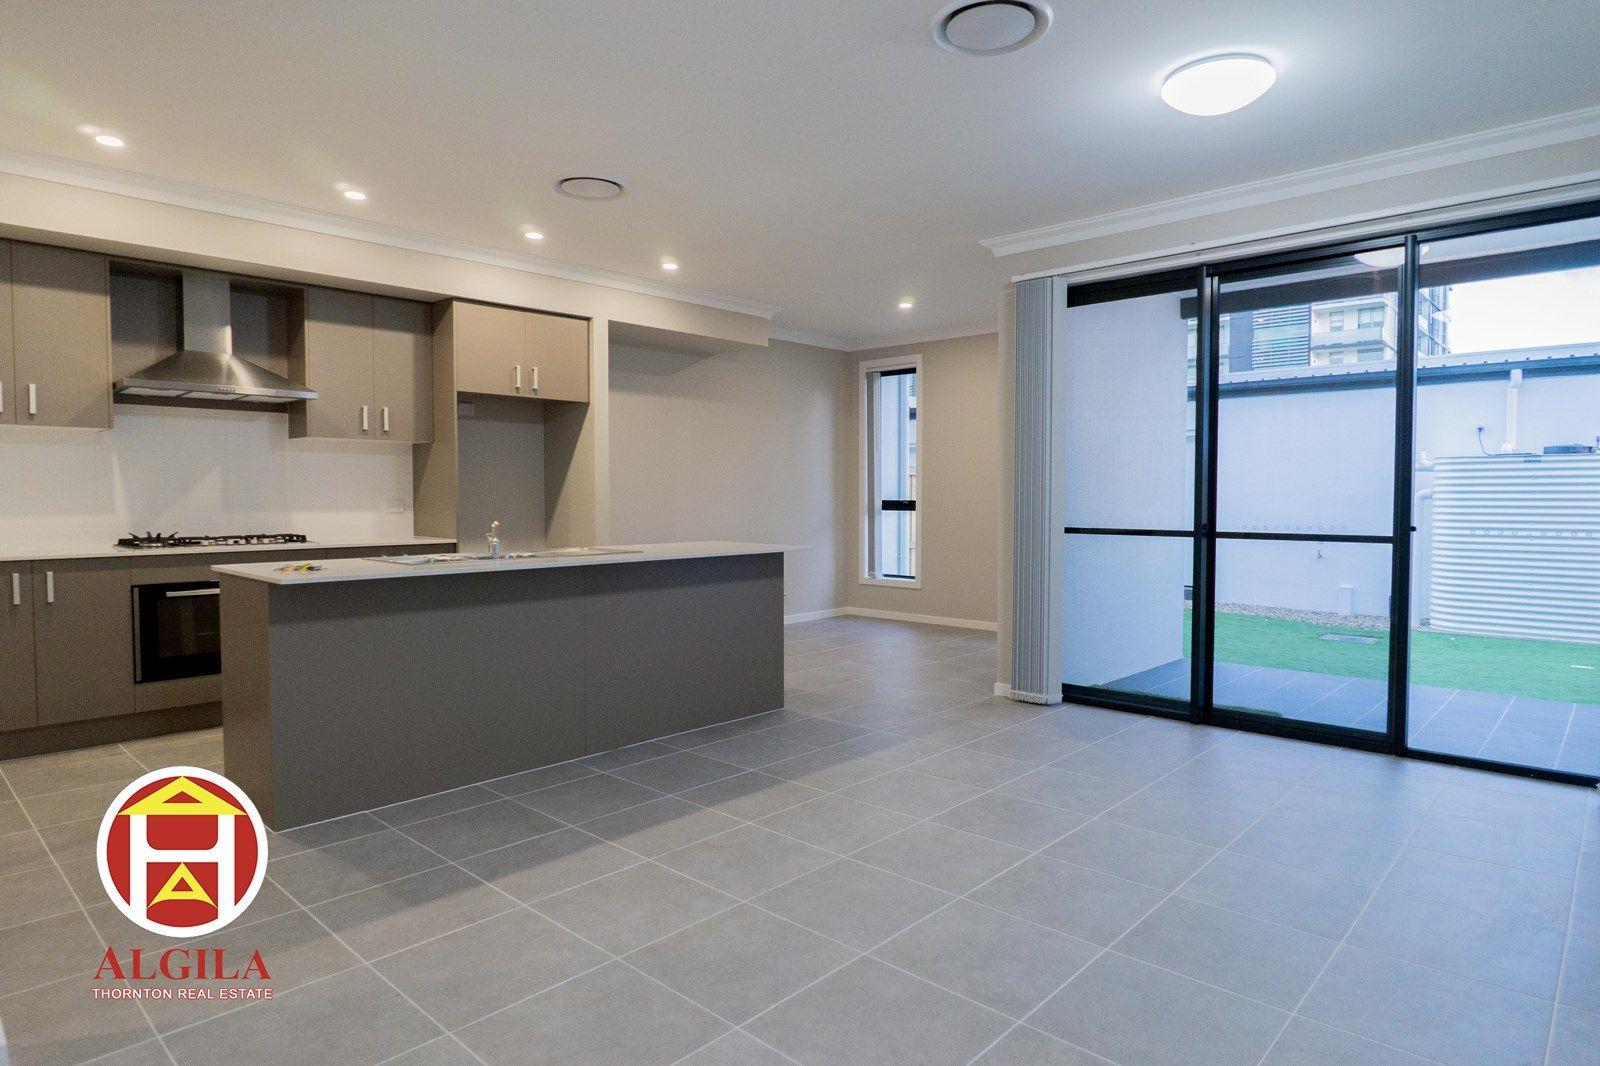 17 Fernandez Lane, Penrith NSW 2750, Image 1